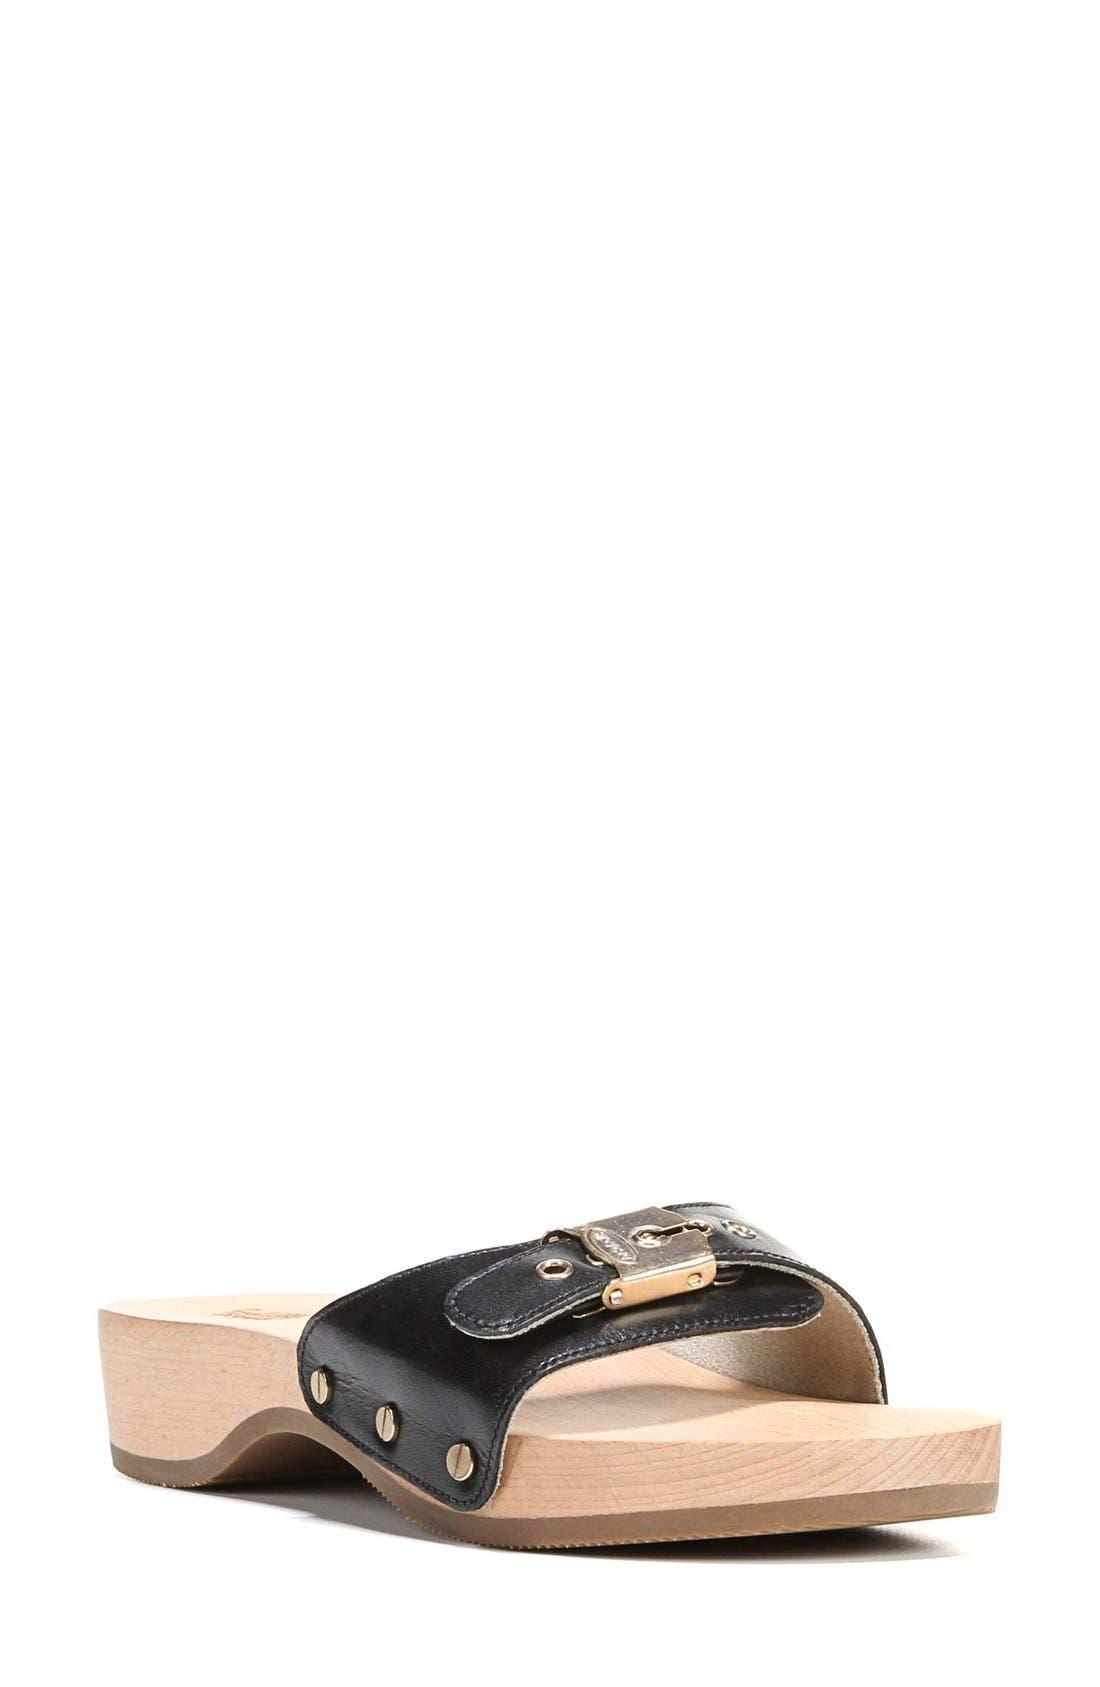 Alternate Image 1 Selected - Dr. Scholl's Original Collection Sandal